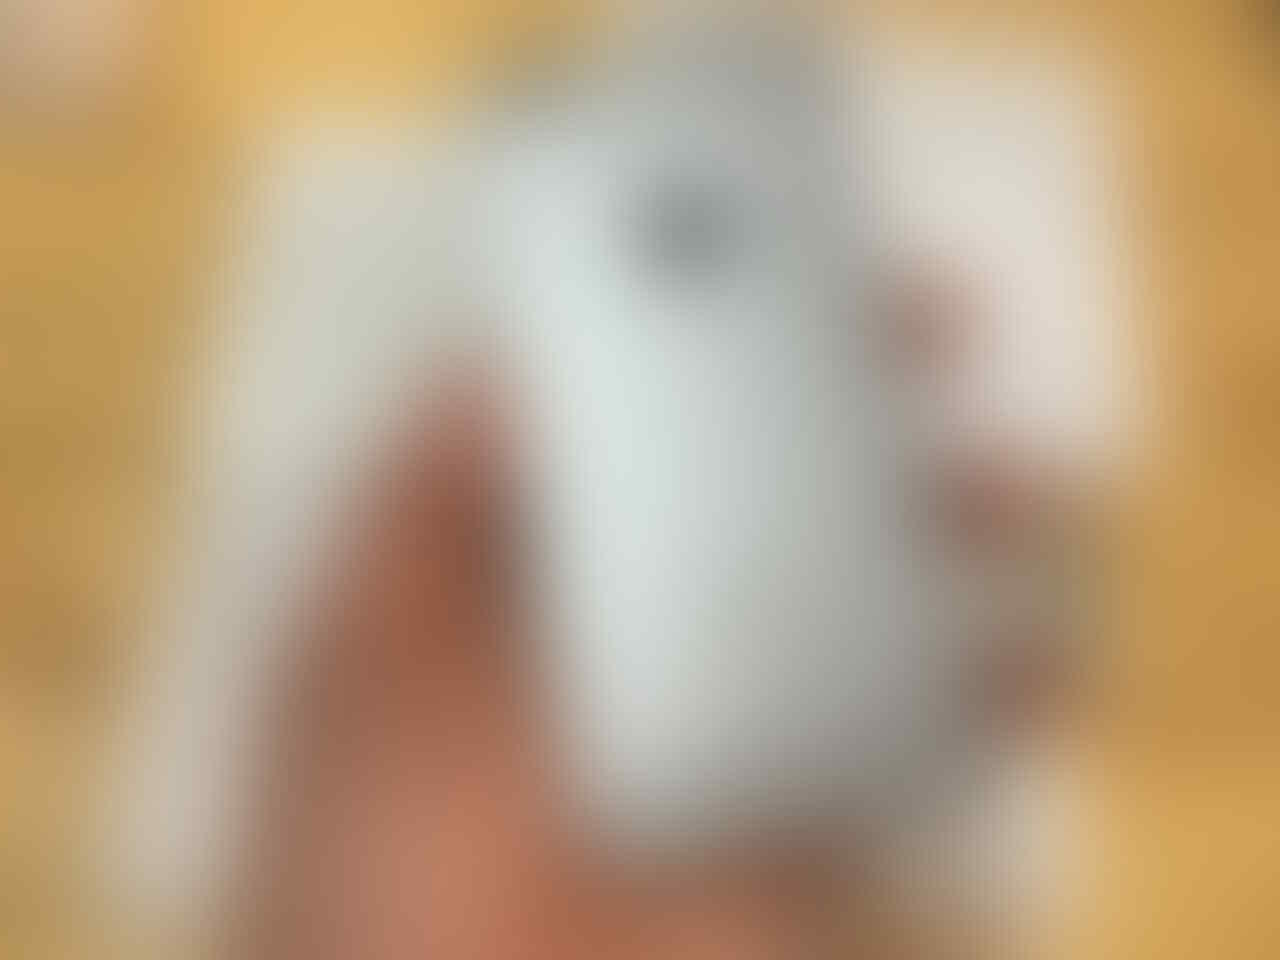 IPHONE 6S GREY 16GB FU FULLSET MULUSS NORMAL MURAAHH 3200 SAJA [MALANG]